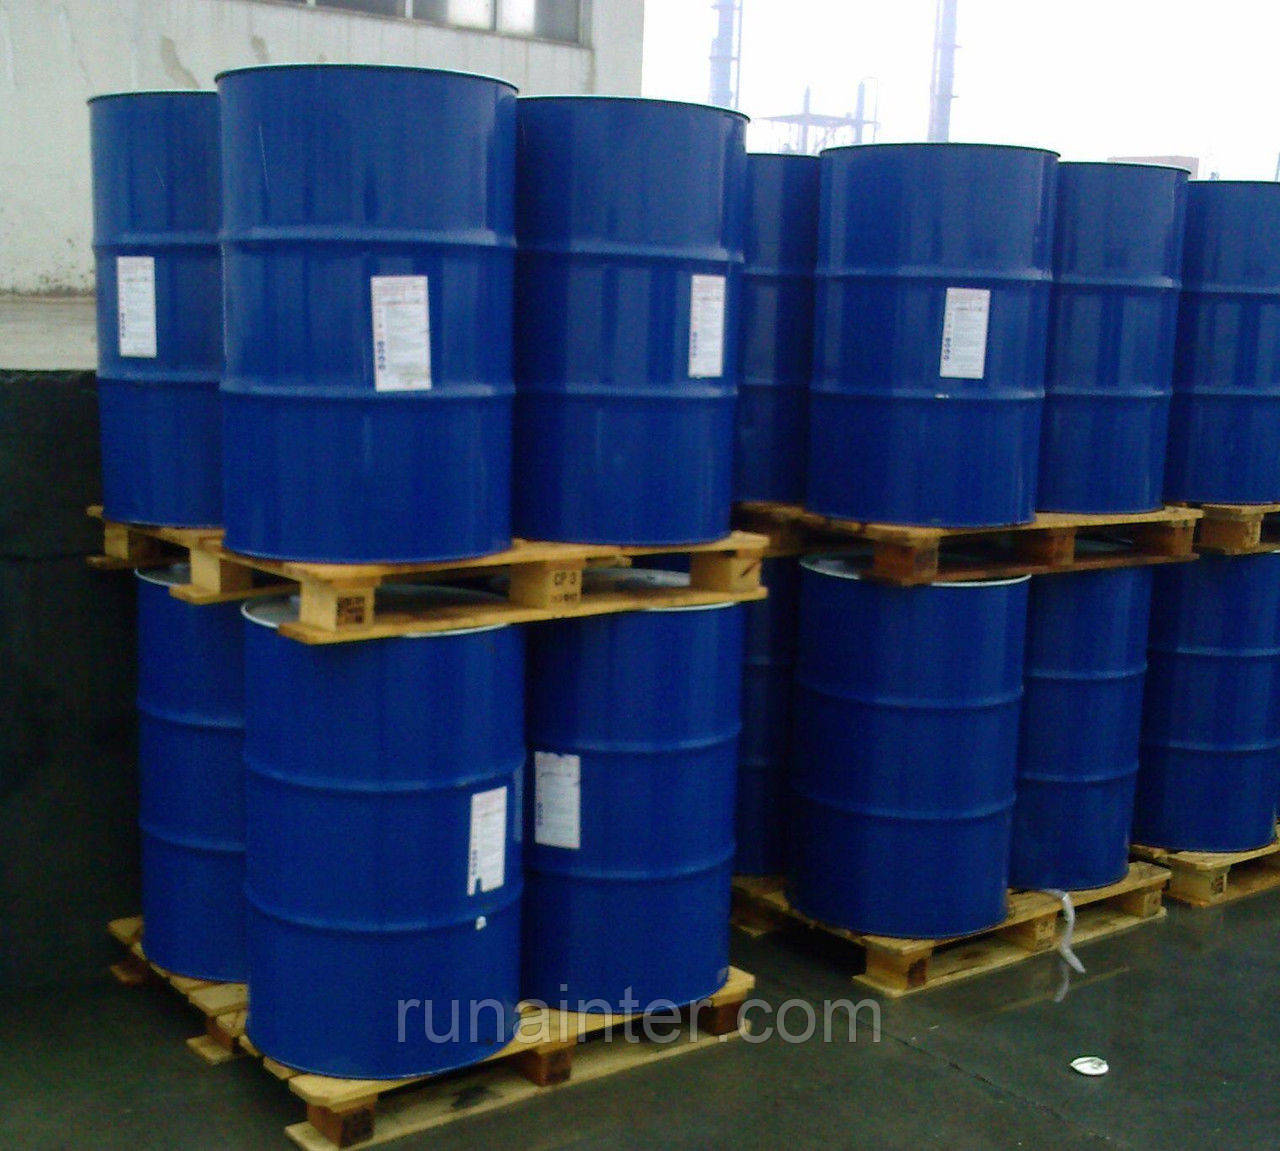 Метилен хлористый (метилен хлорид) технический